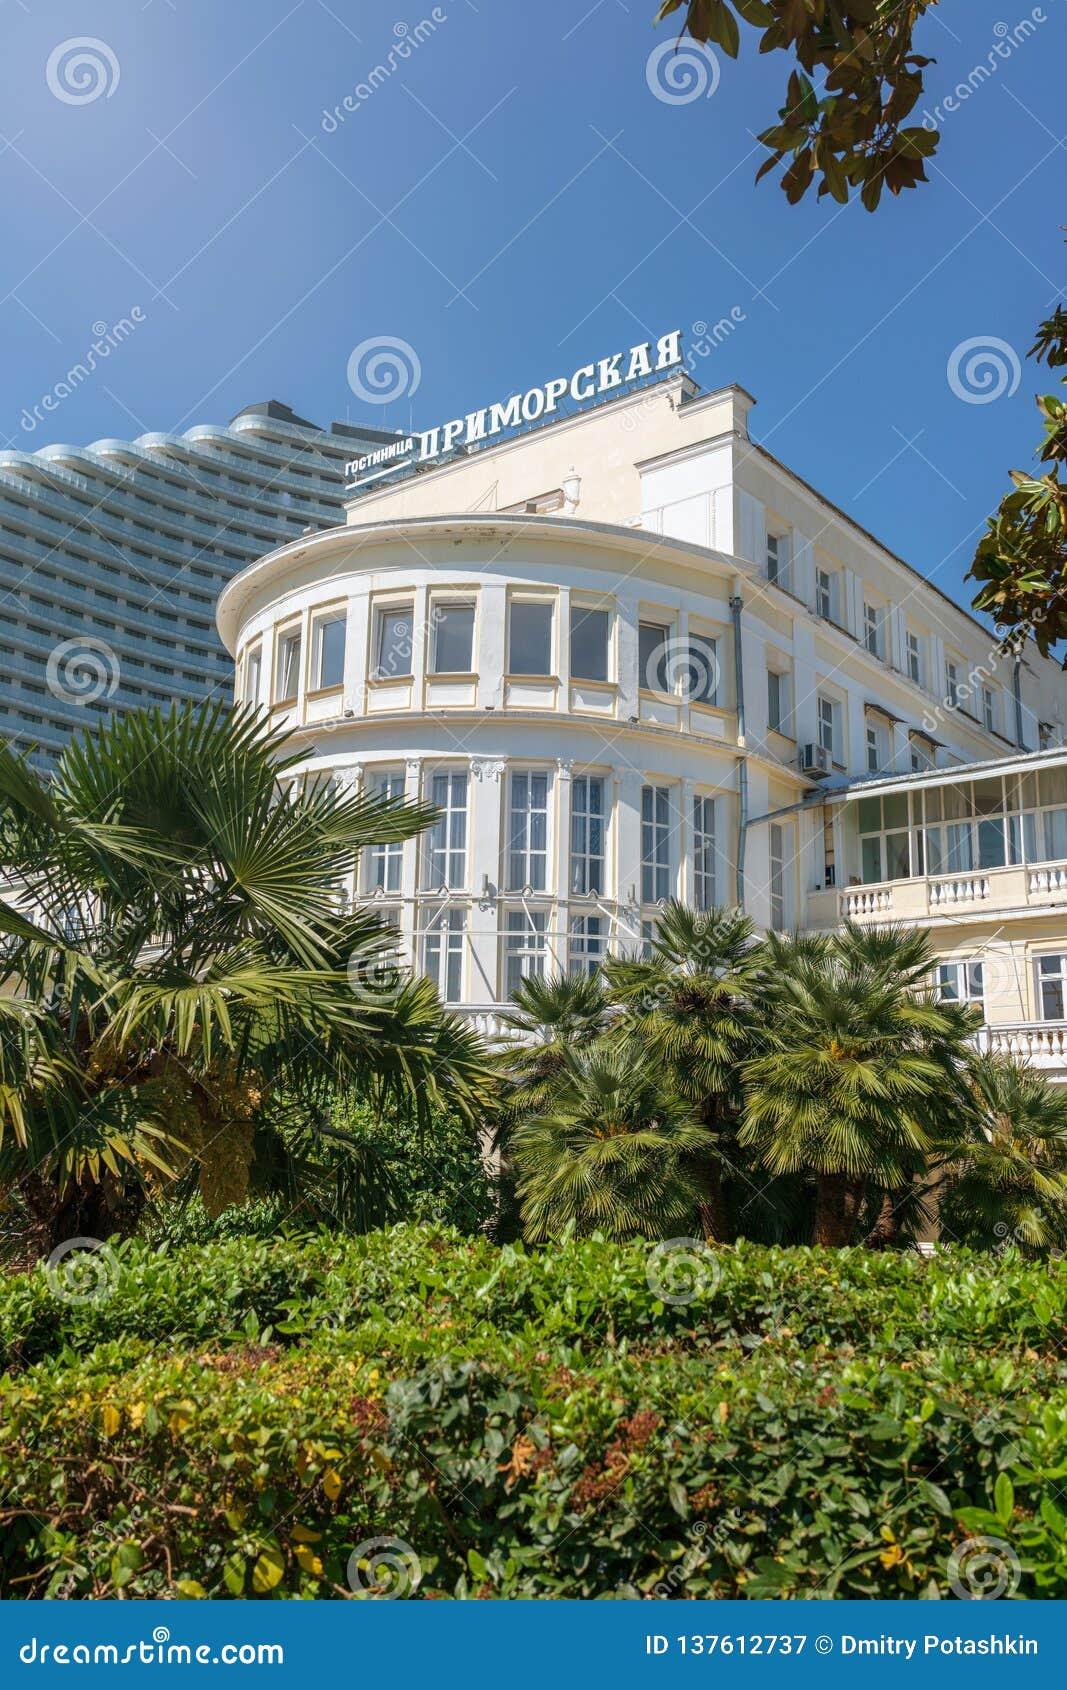 Sochi - russo Feseration - 3 de maio de 2018 - hotel Primorskaya